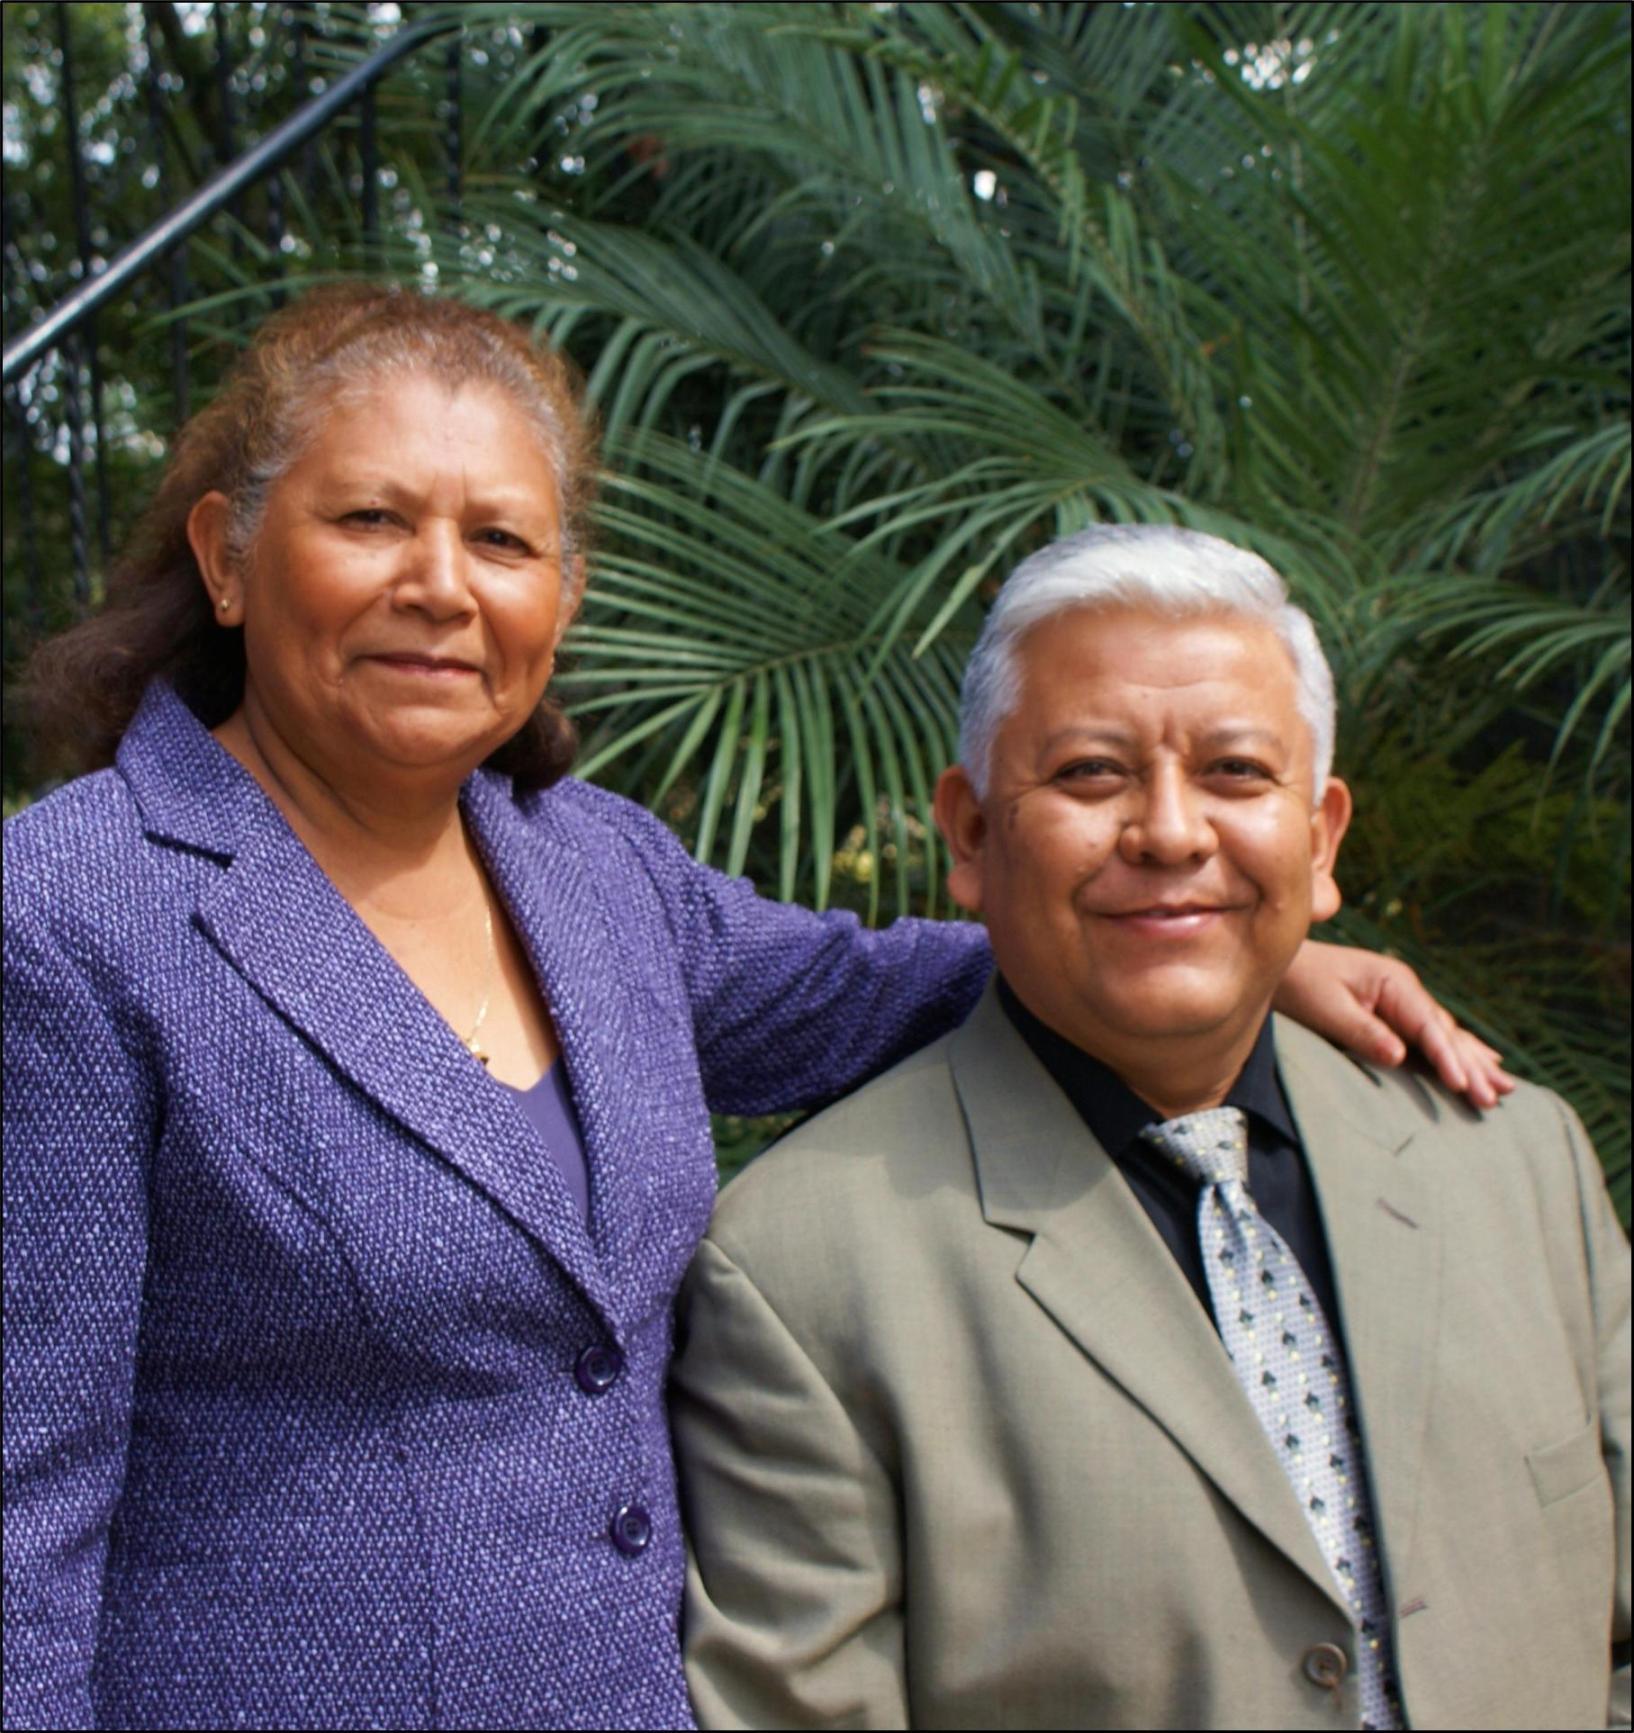 Ulises and Micaela Solis